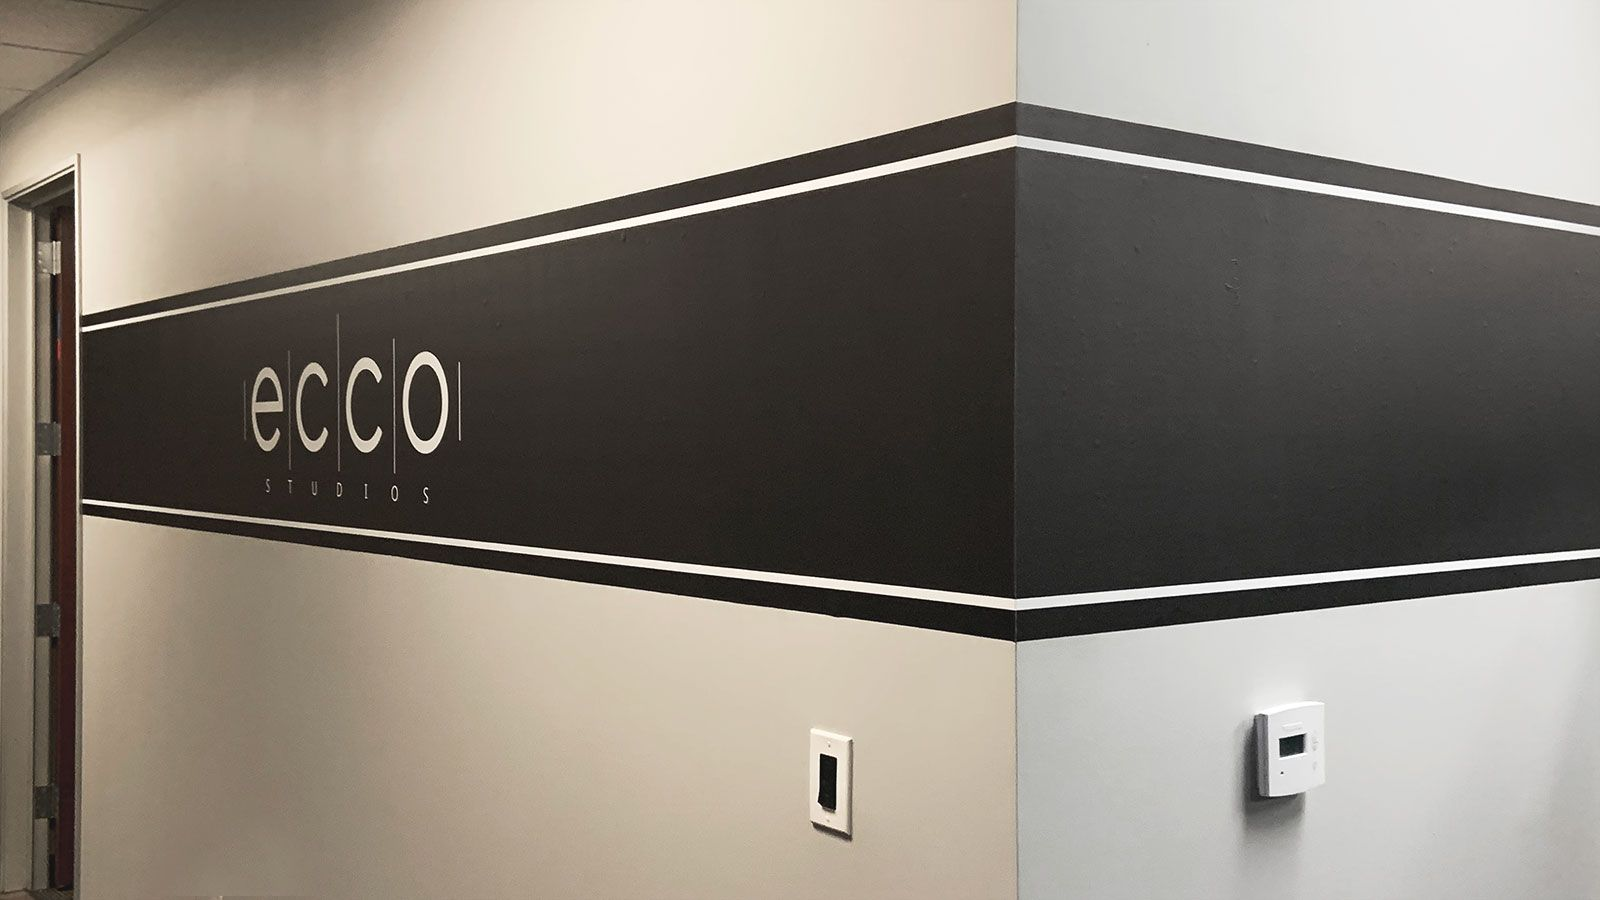 Ecco Studios office wall decal